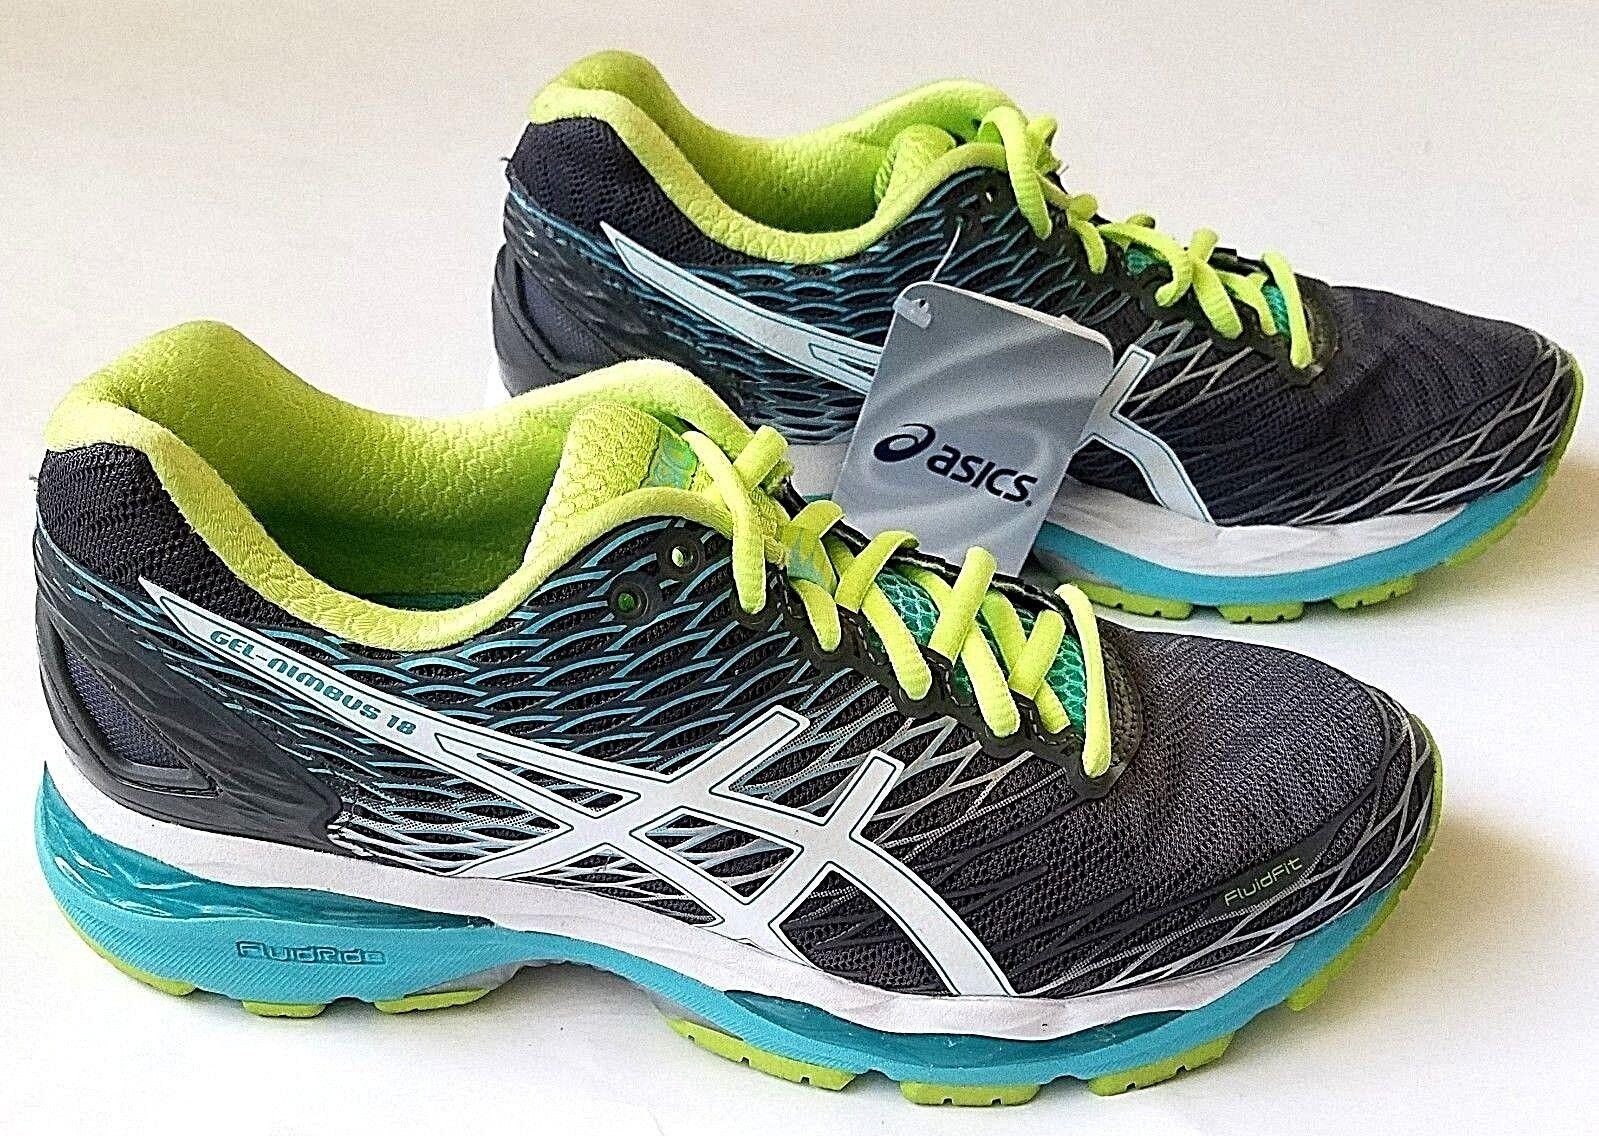 Asics Womens T650N Titanium/White/Turquoise running shoes Comfortable Seasonal clearance sale